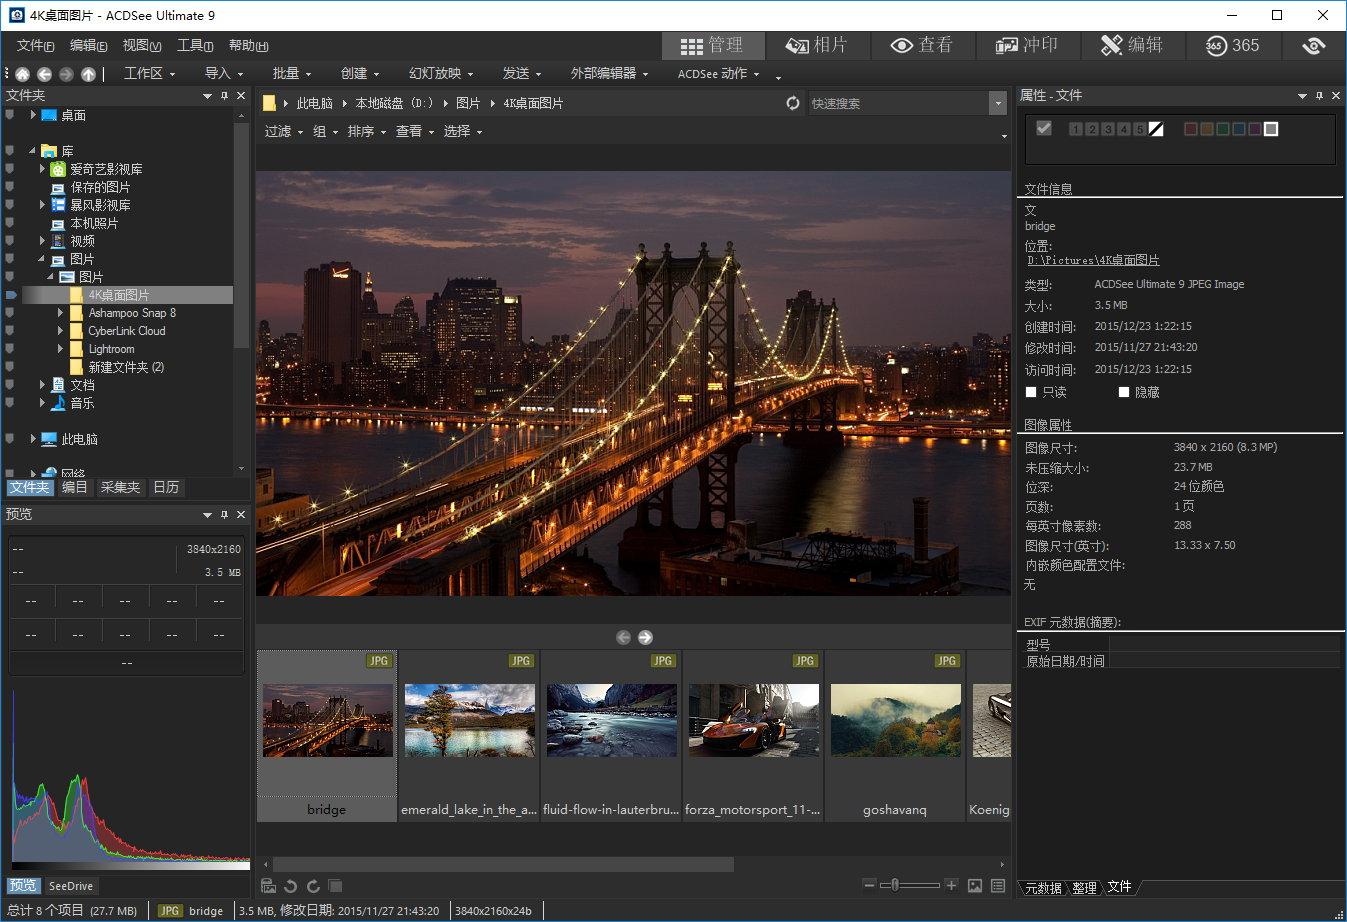 ACDSee Ultimate v9.3.0.674 x64 中文注册版附注册机-图像管理